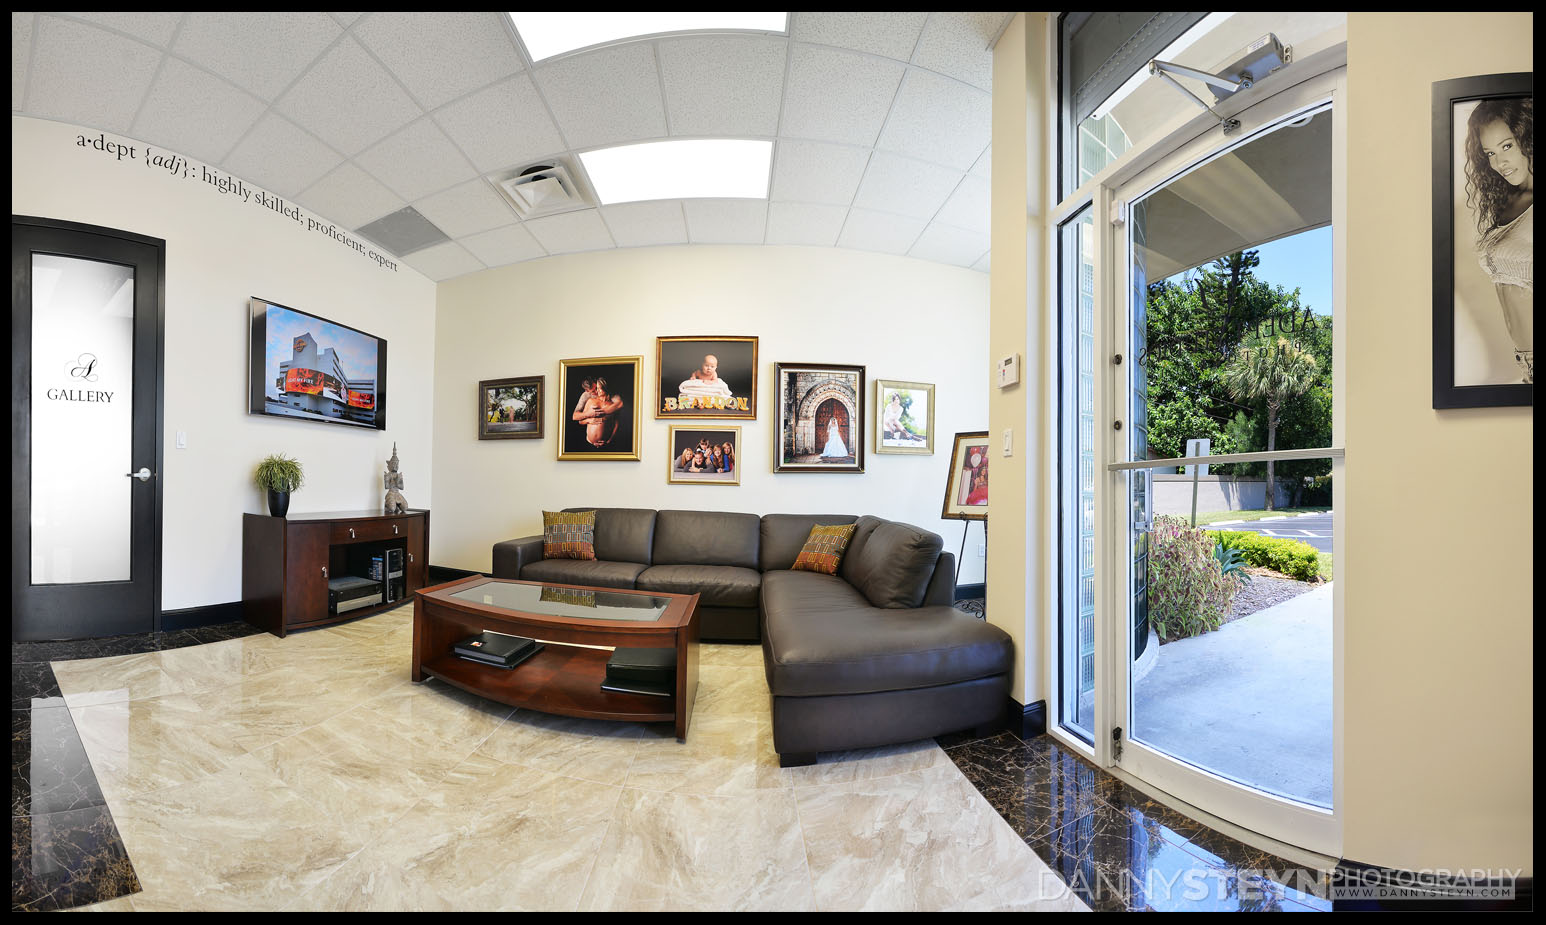 Danny Steyn Photography Studios - Front Lobby